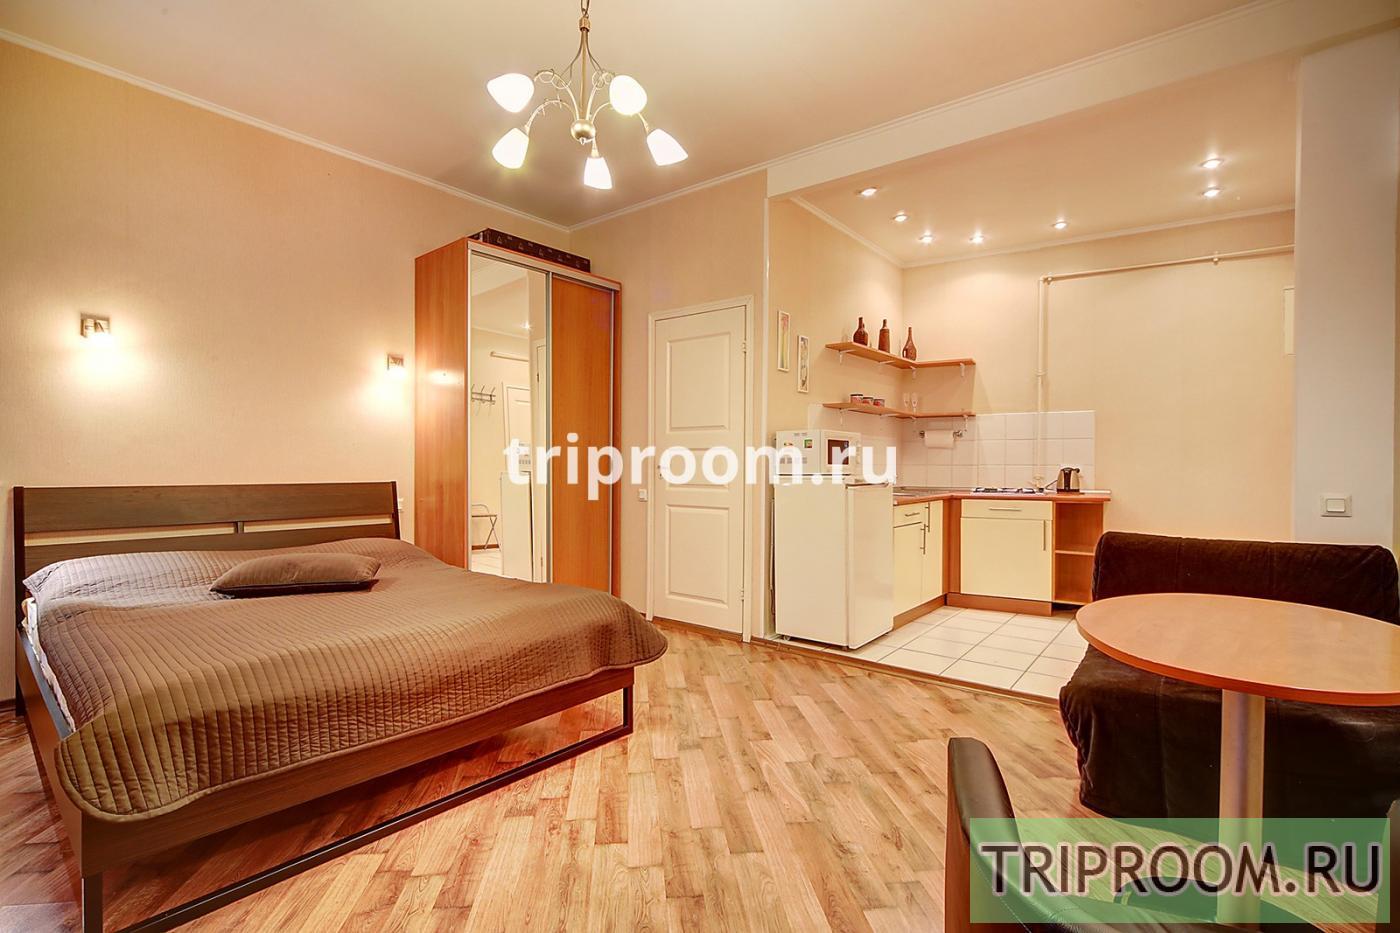 1-комнатная квартира посуточно (вариант № 15082), ул. Невский проспект, фото № 3